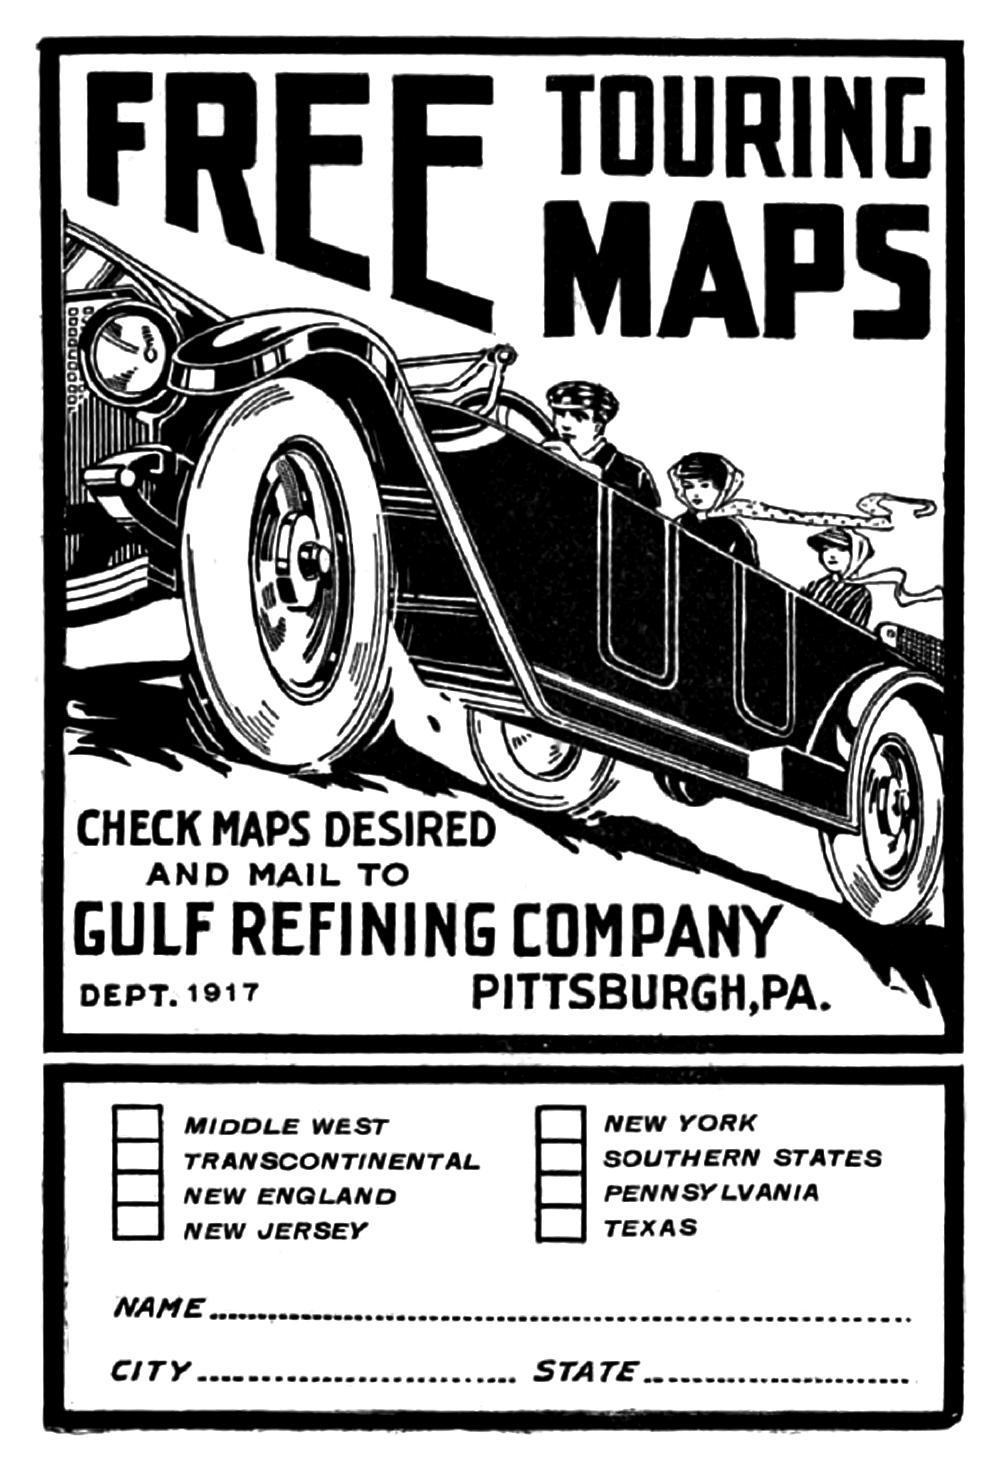 Gulf Refining Company - 1927